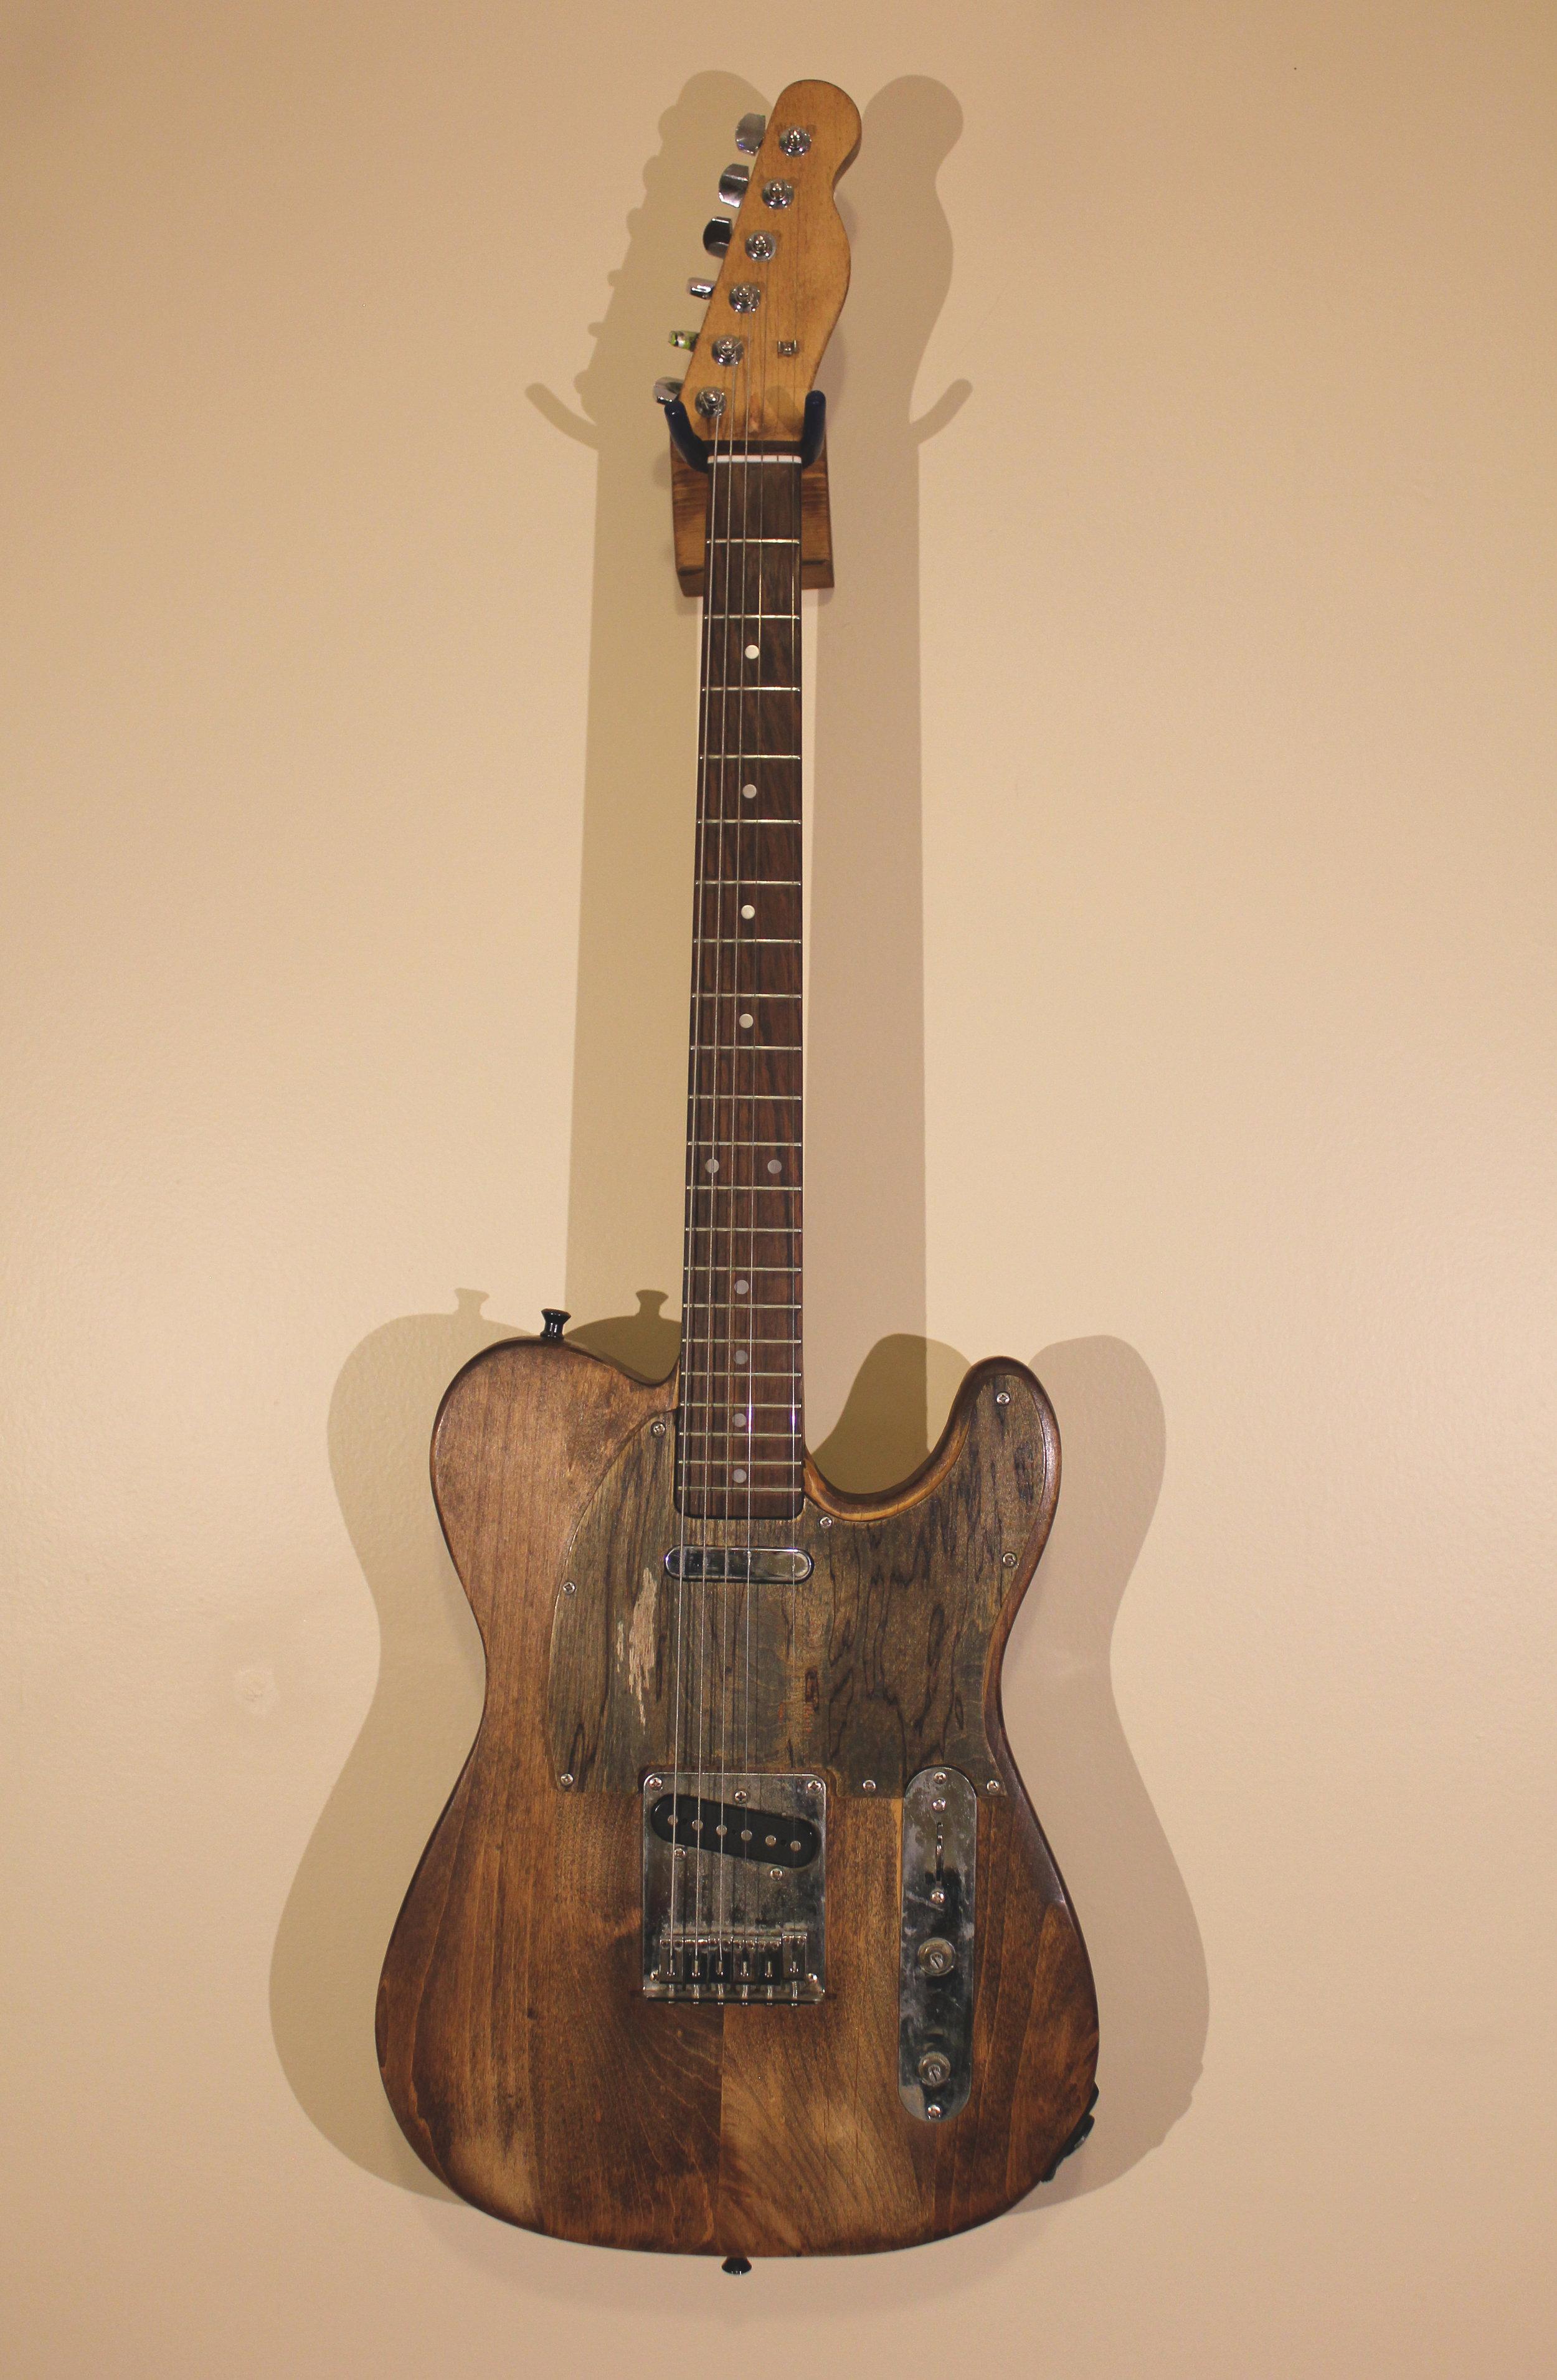 Tele Custom   -not for sale- squier telecaster, woodstain, birch panel pickguard, sealer